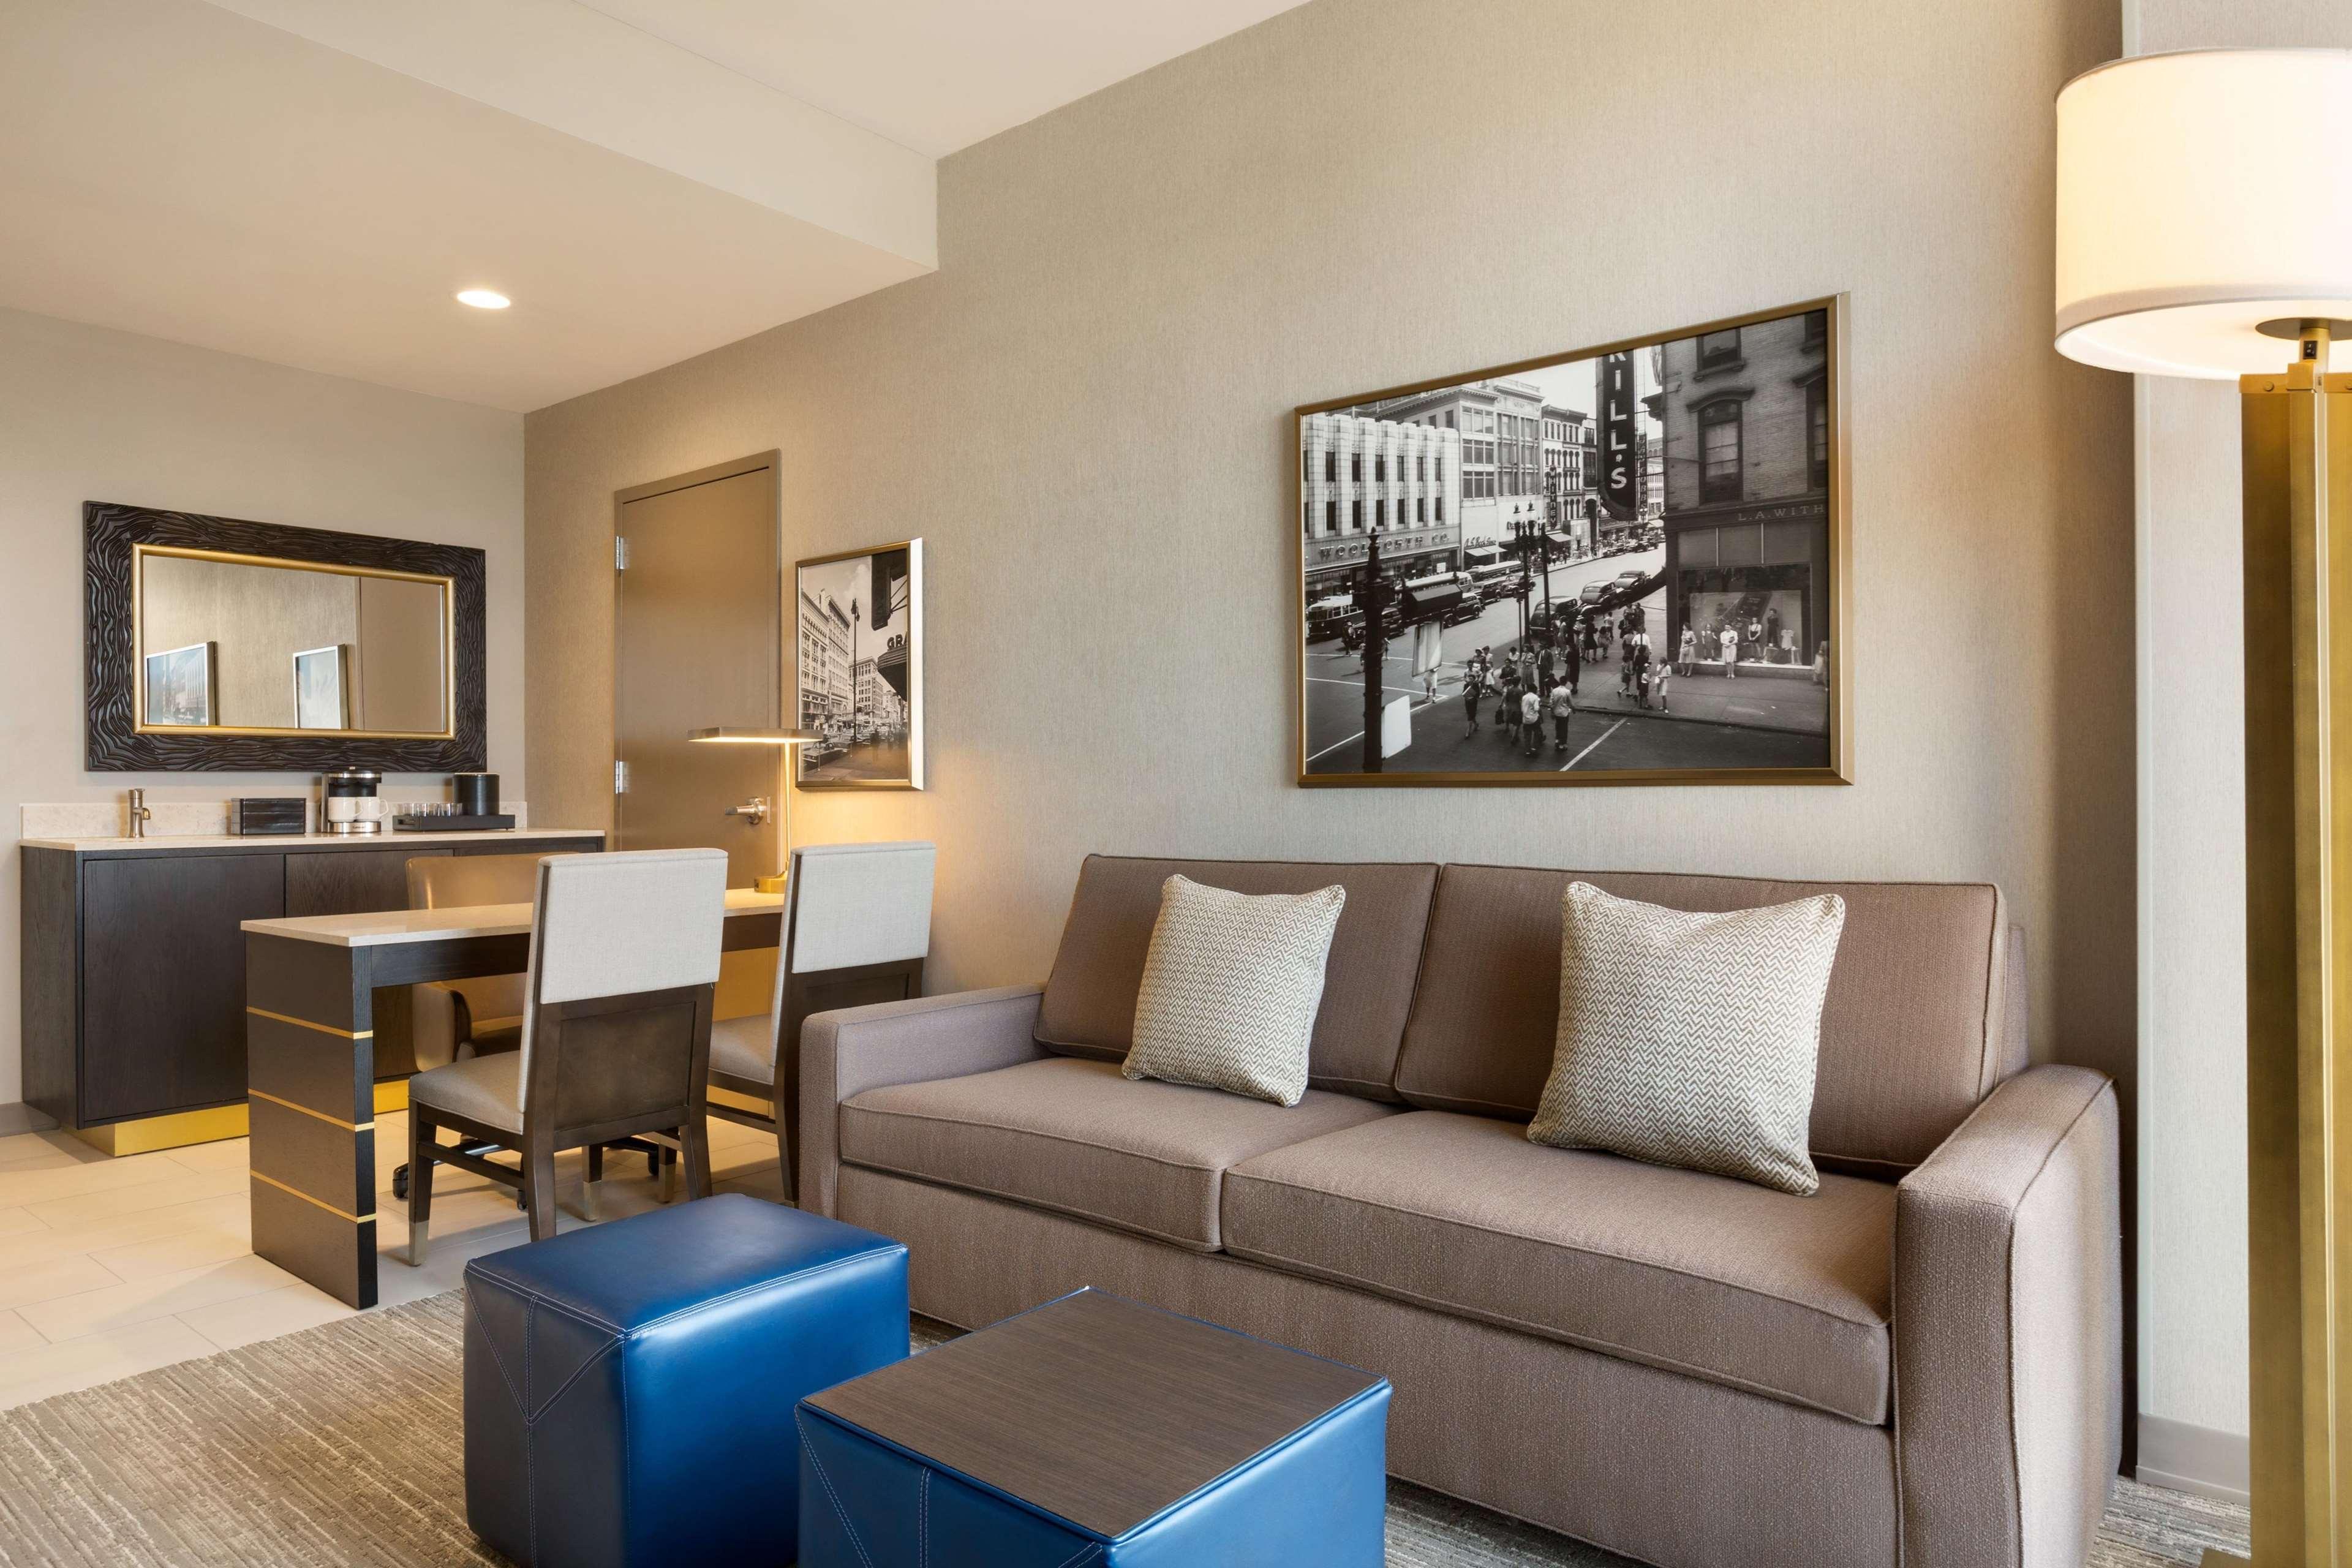 Embassy Suites by Hilton Syracuse Destiny USA image 10